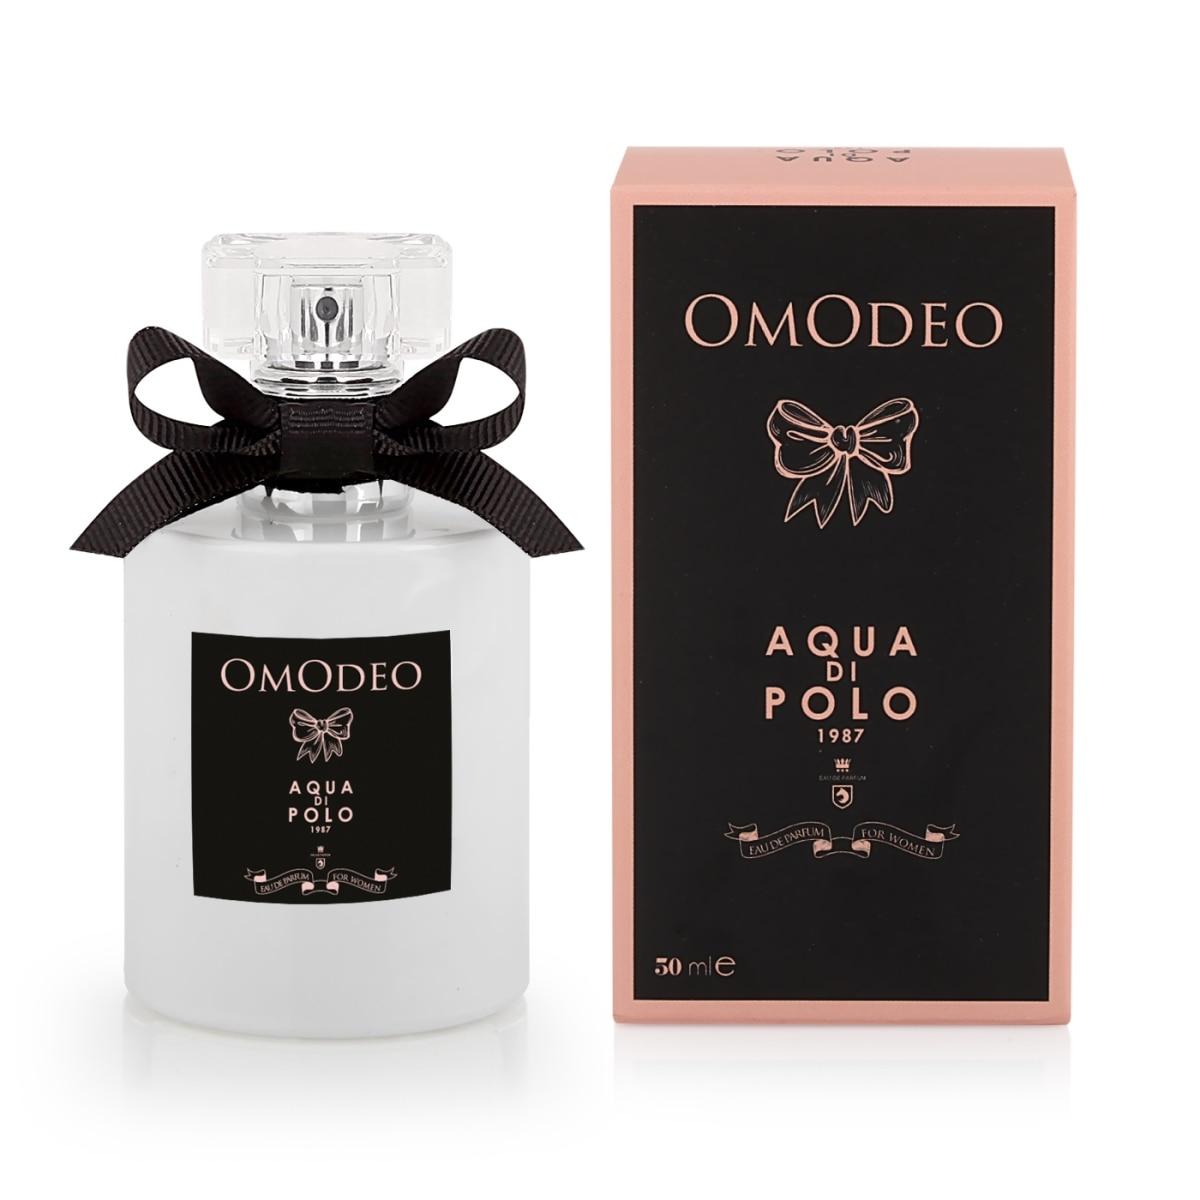 Aqua Di Polo PLWMNPR4 Omodeo Women Perfume